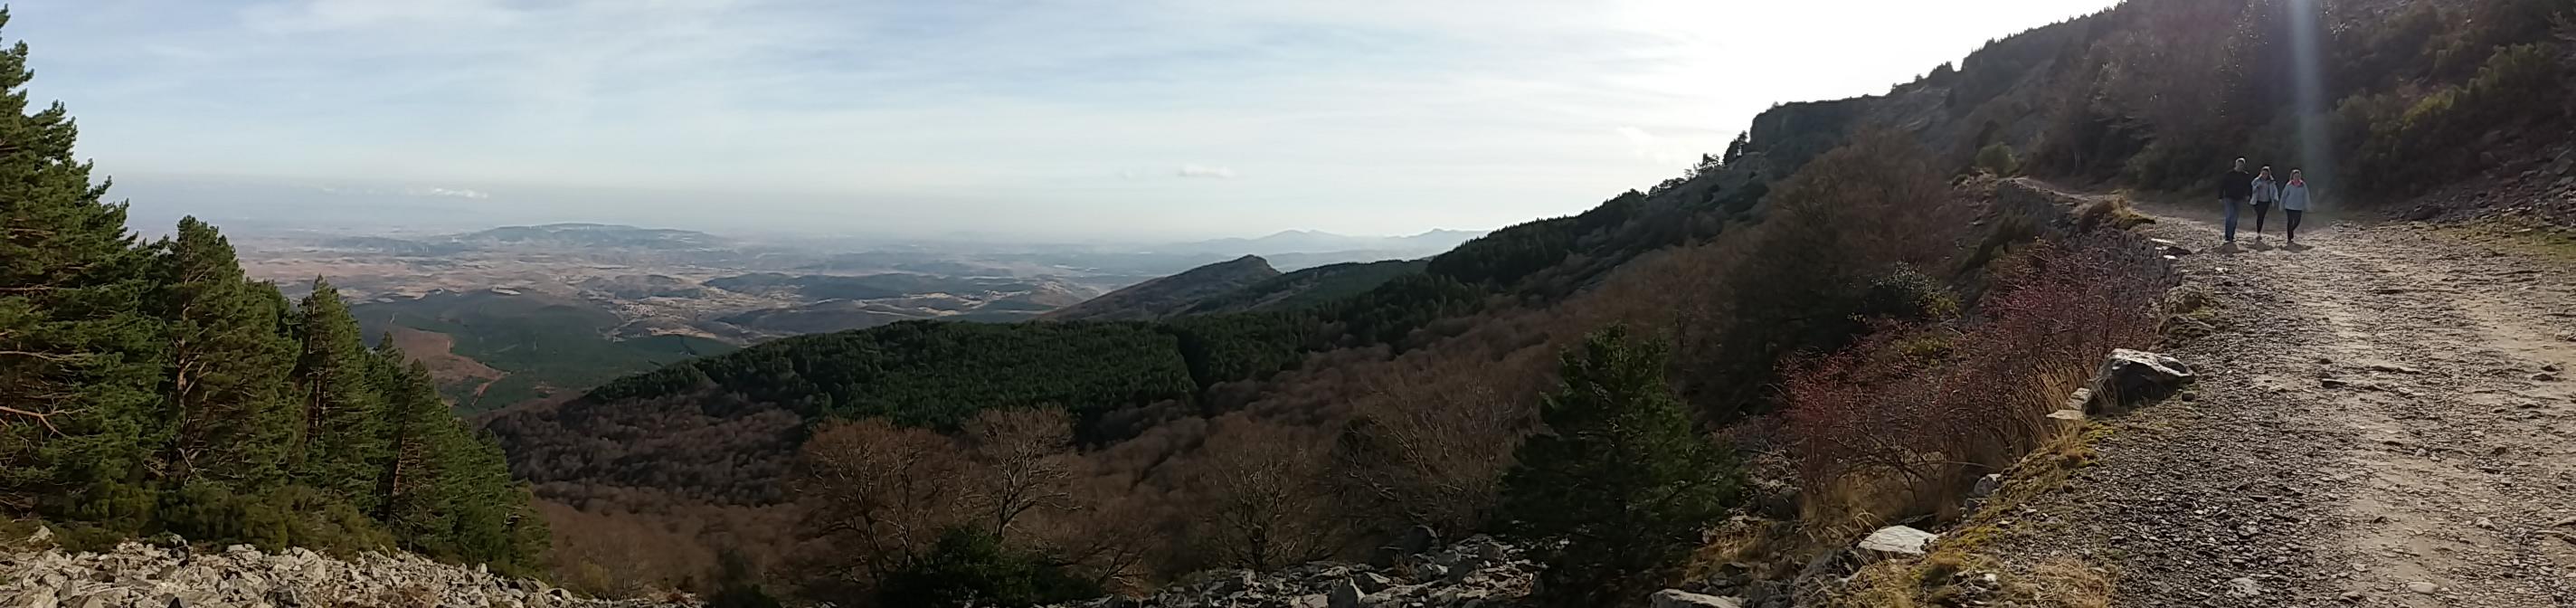 prirodny park Parque natural del Moncayo